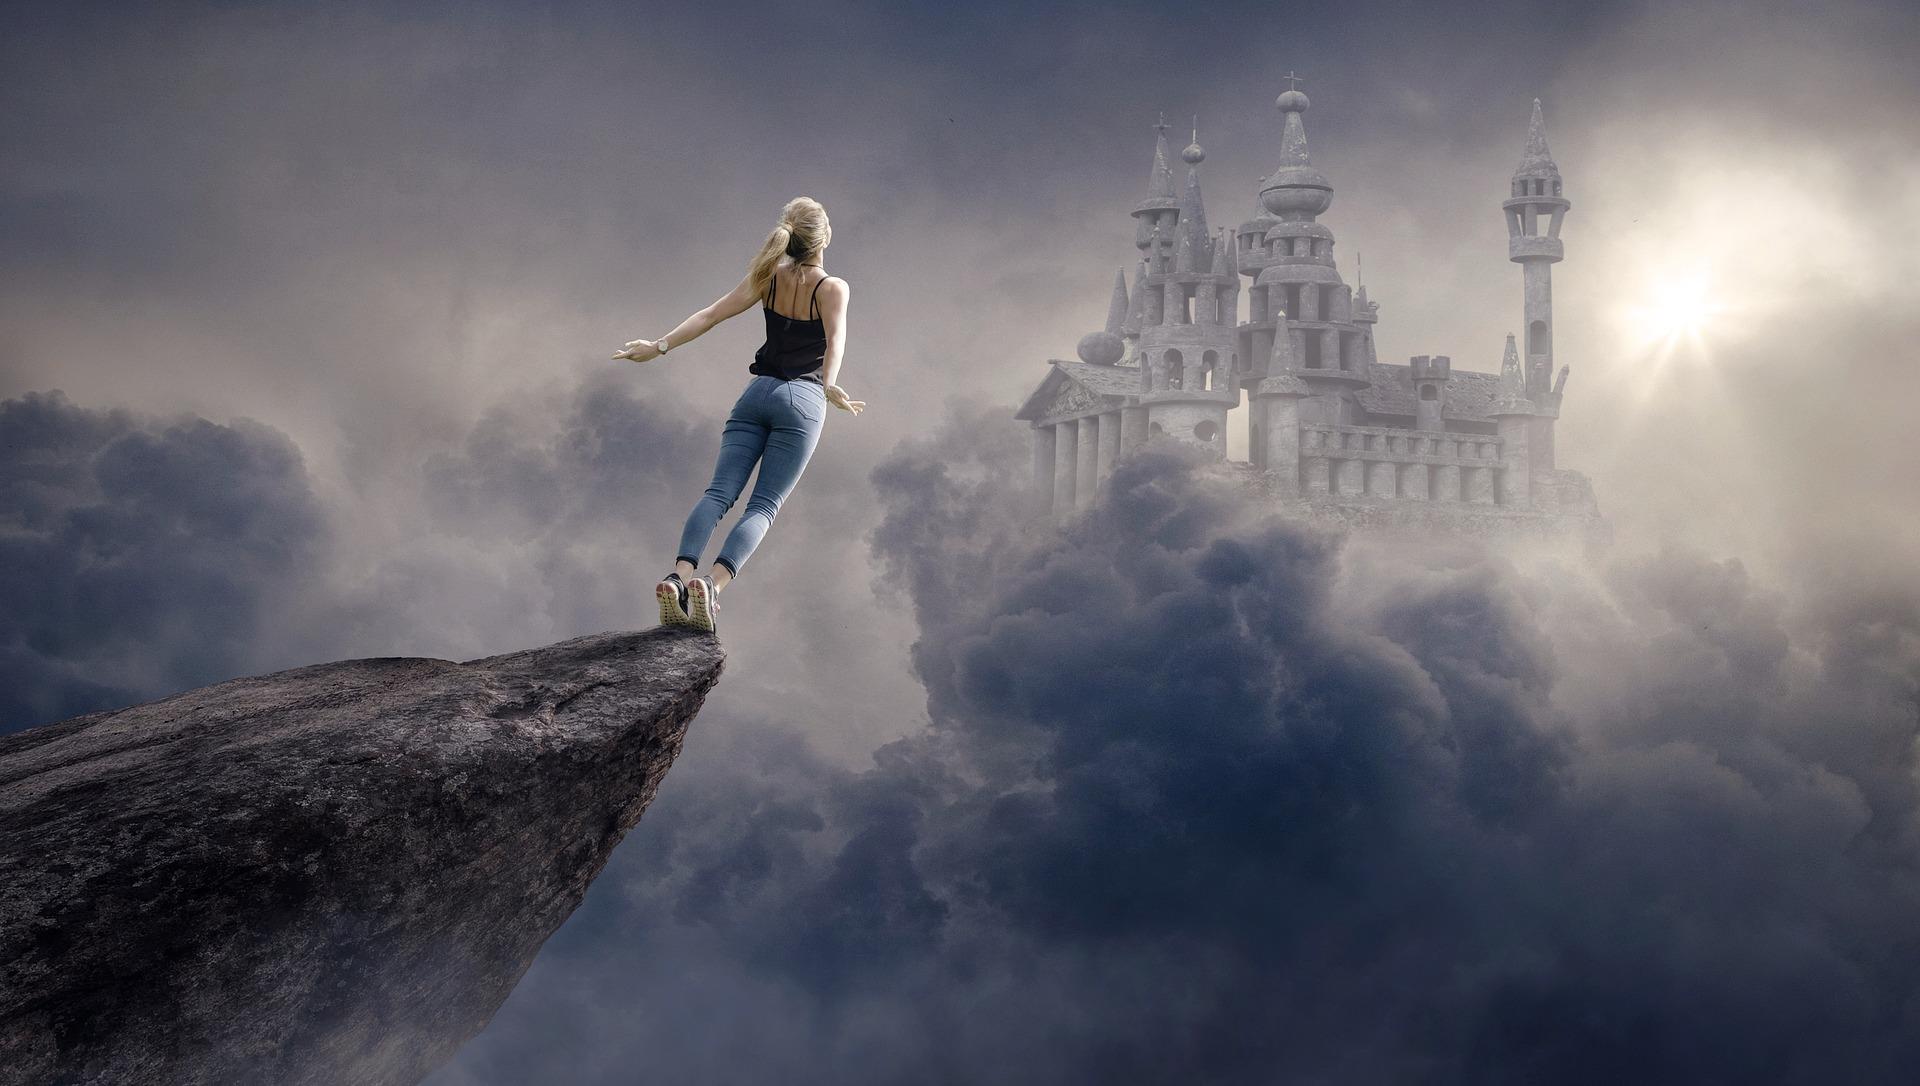 Psychic Abilities 101 - Beyond Homo Sapien